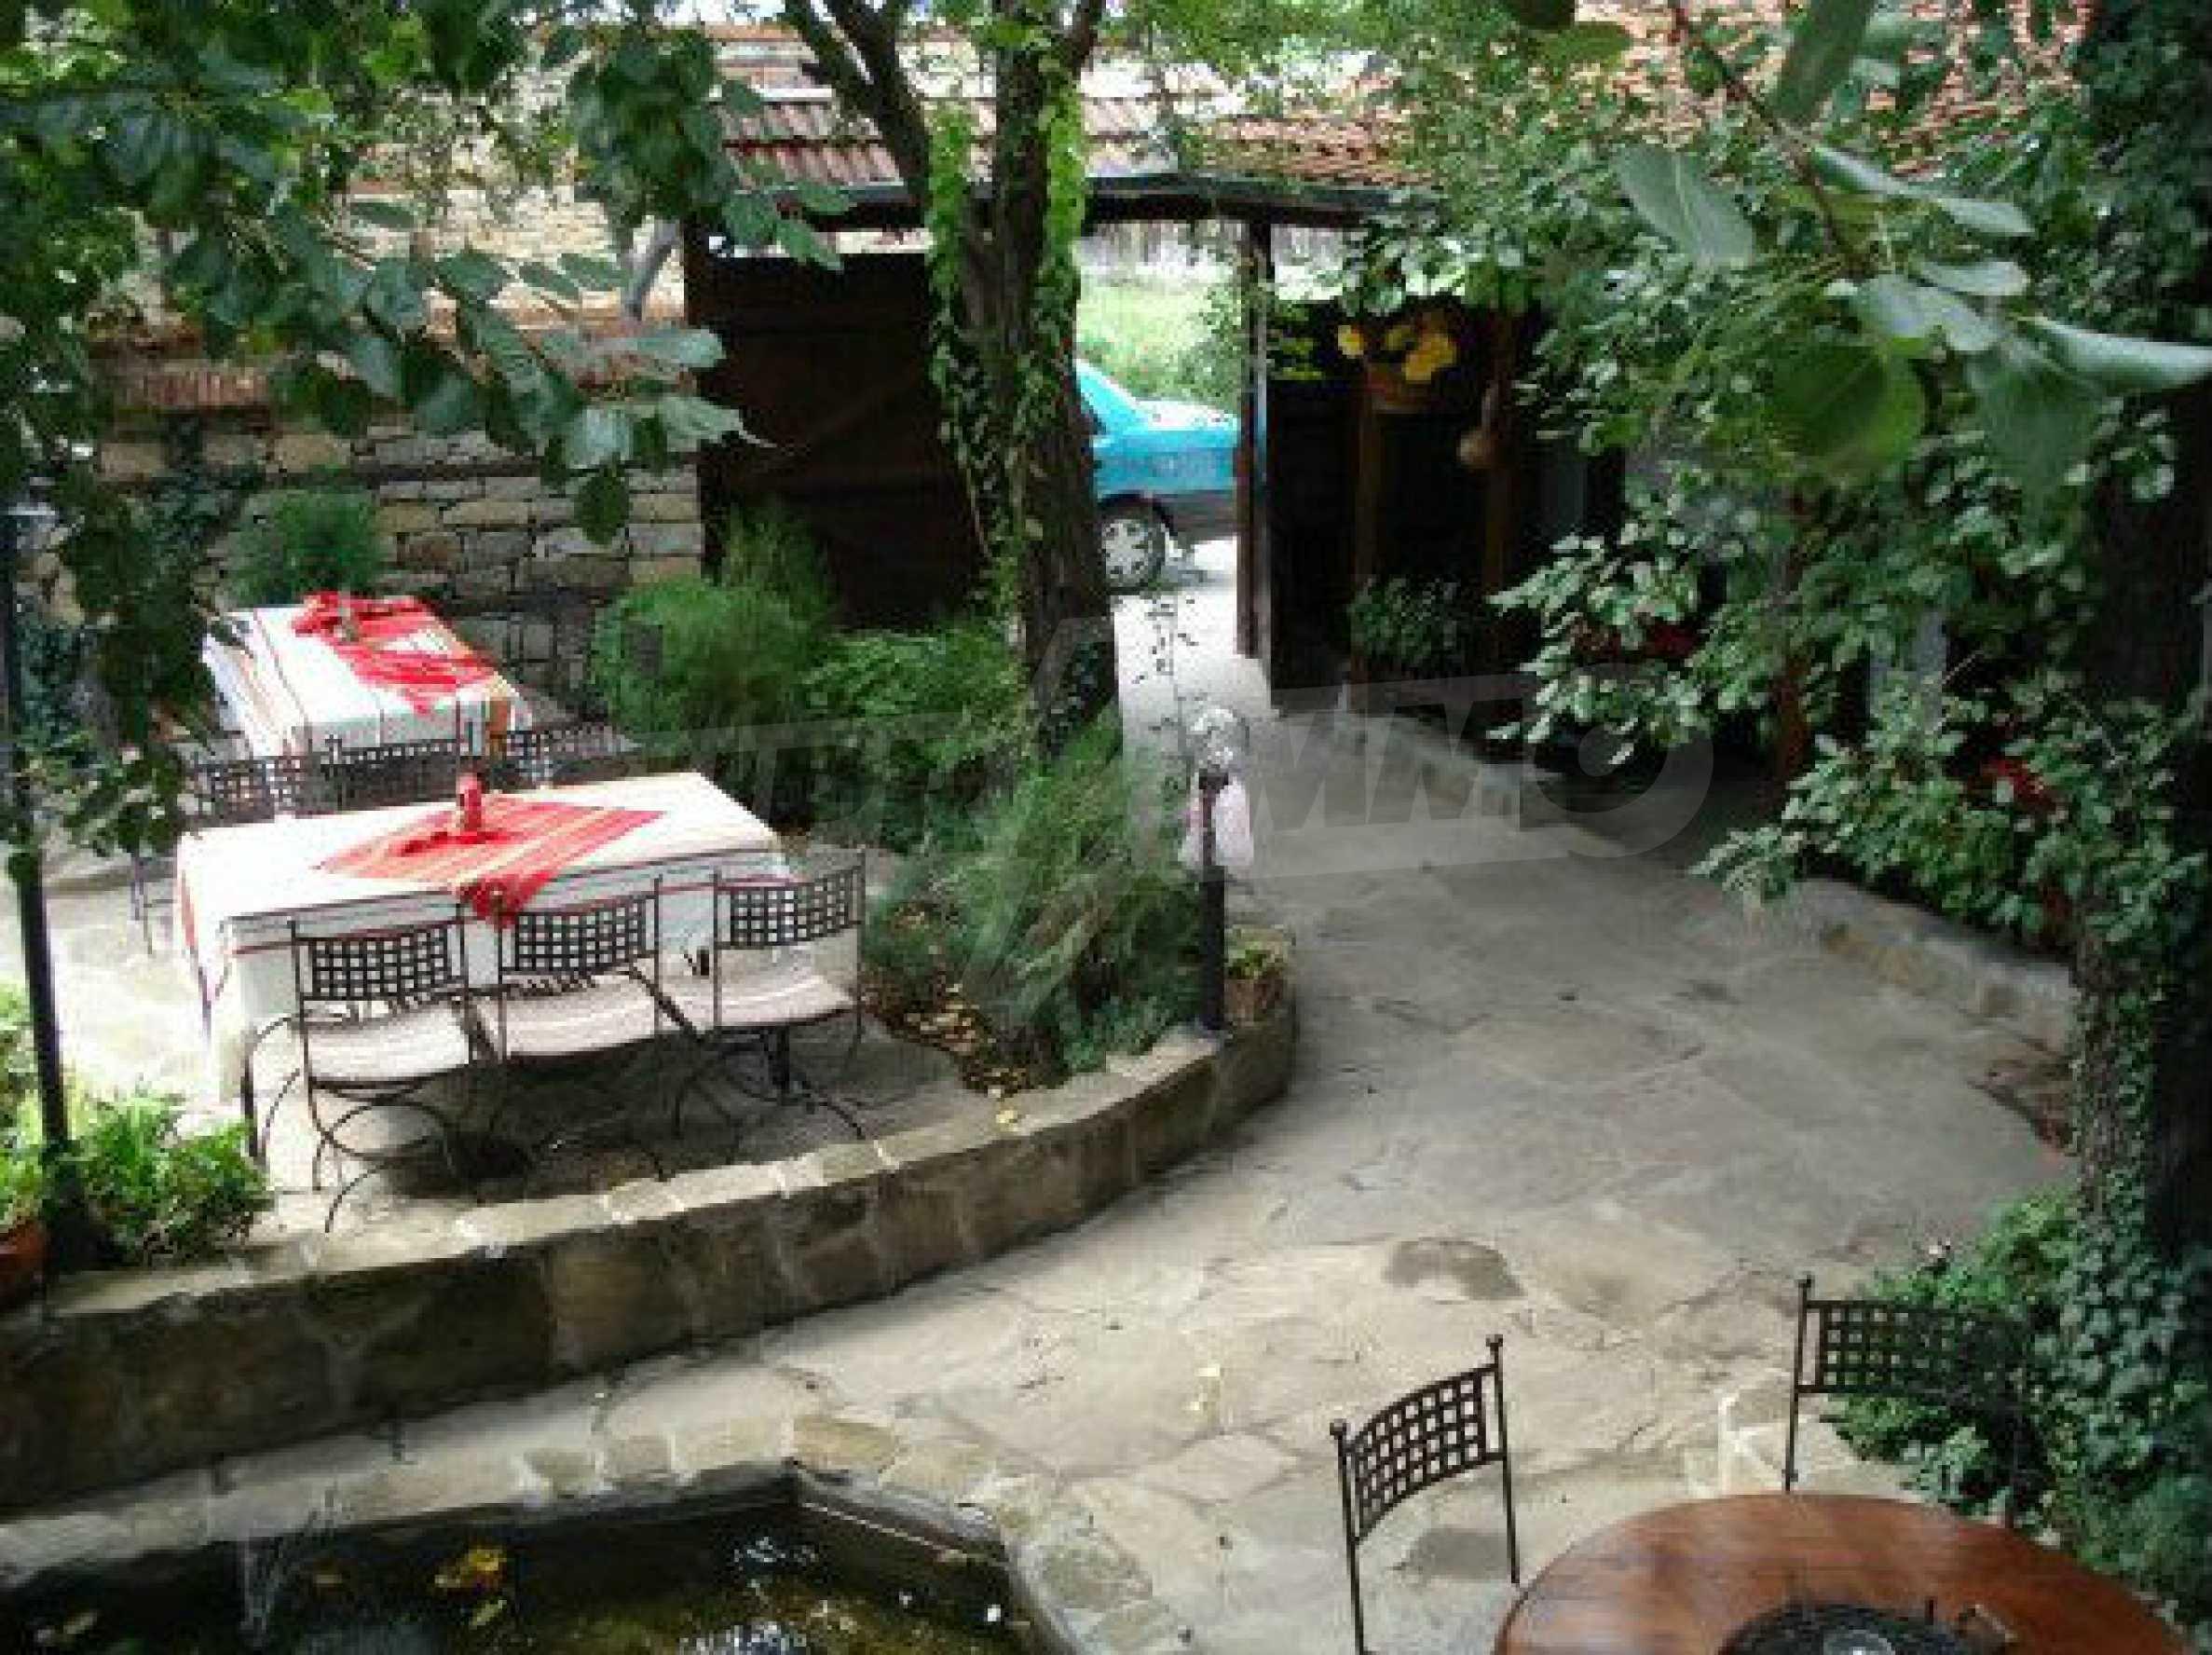 Hotelanlage mit Restaurant am Ufer des Flusses Osam in Lovech 63